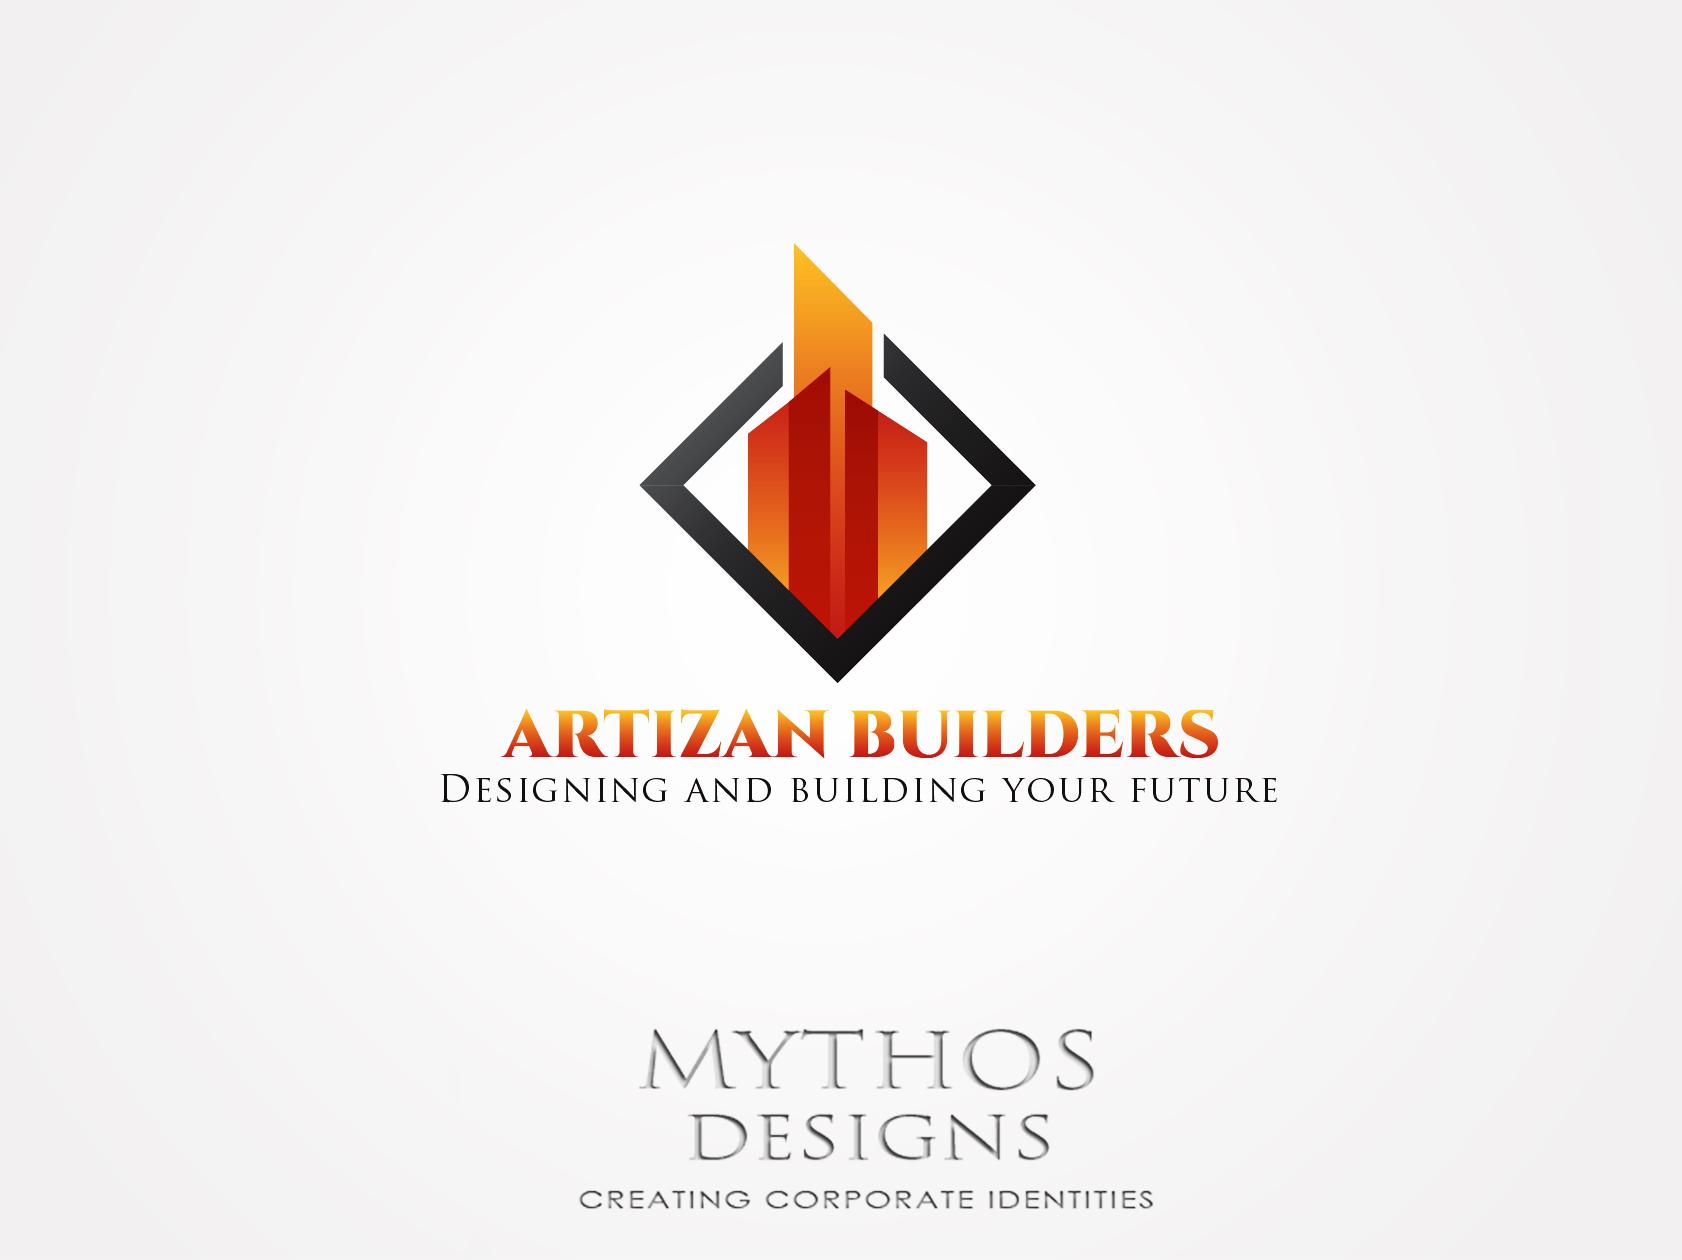 Logo Design by Mythos Designs - Entry No. 164 in the Logo Design Contest Captivating Logo Design for Artisan Builders.